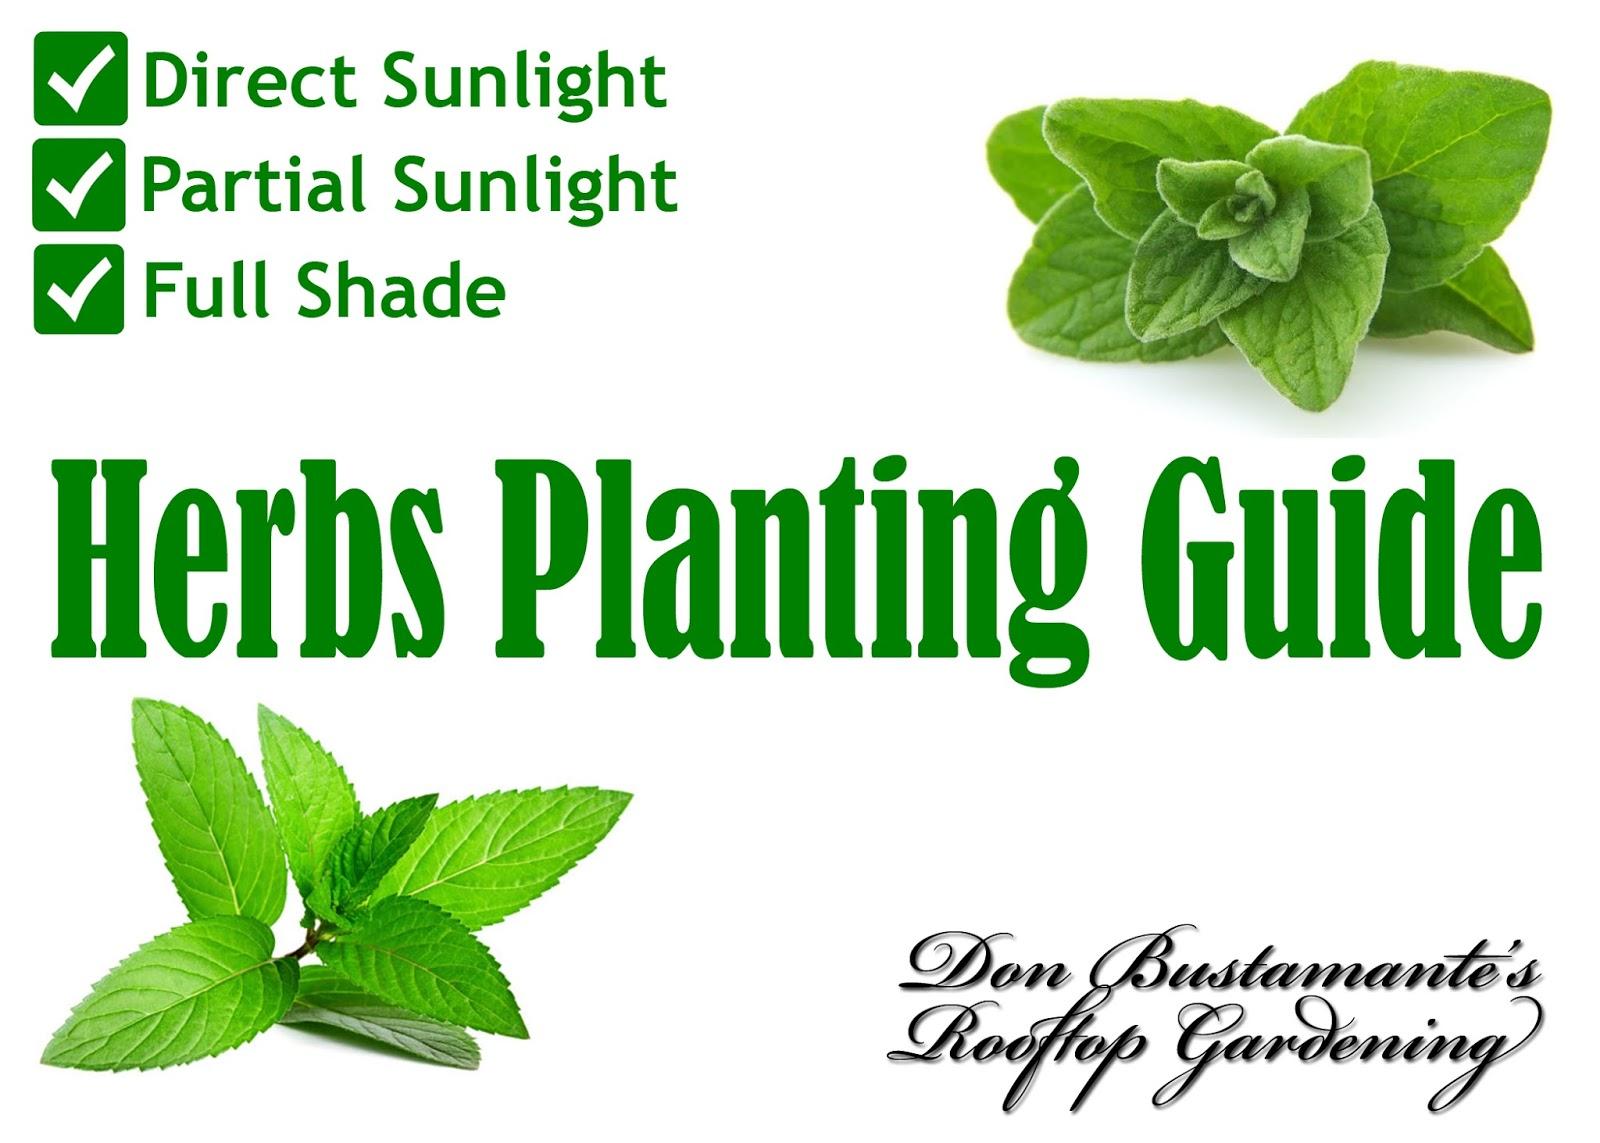 Don Bustamante's Rooftop Garden: Herbs Planting Guide